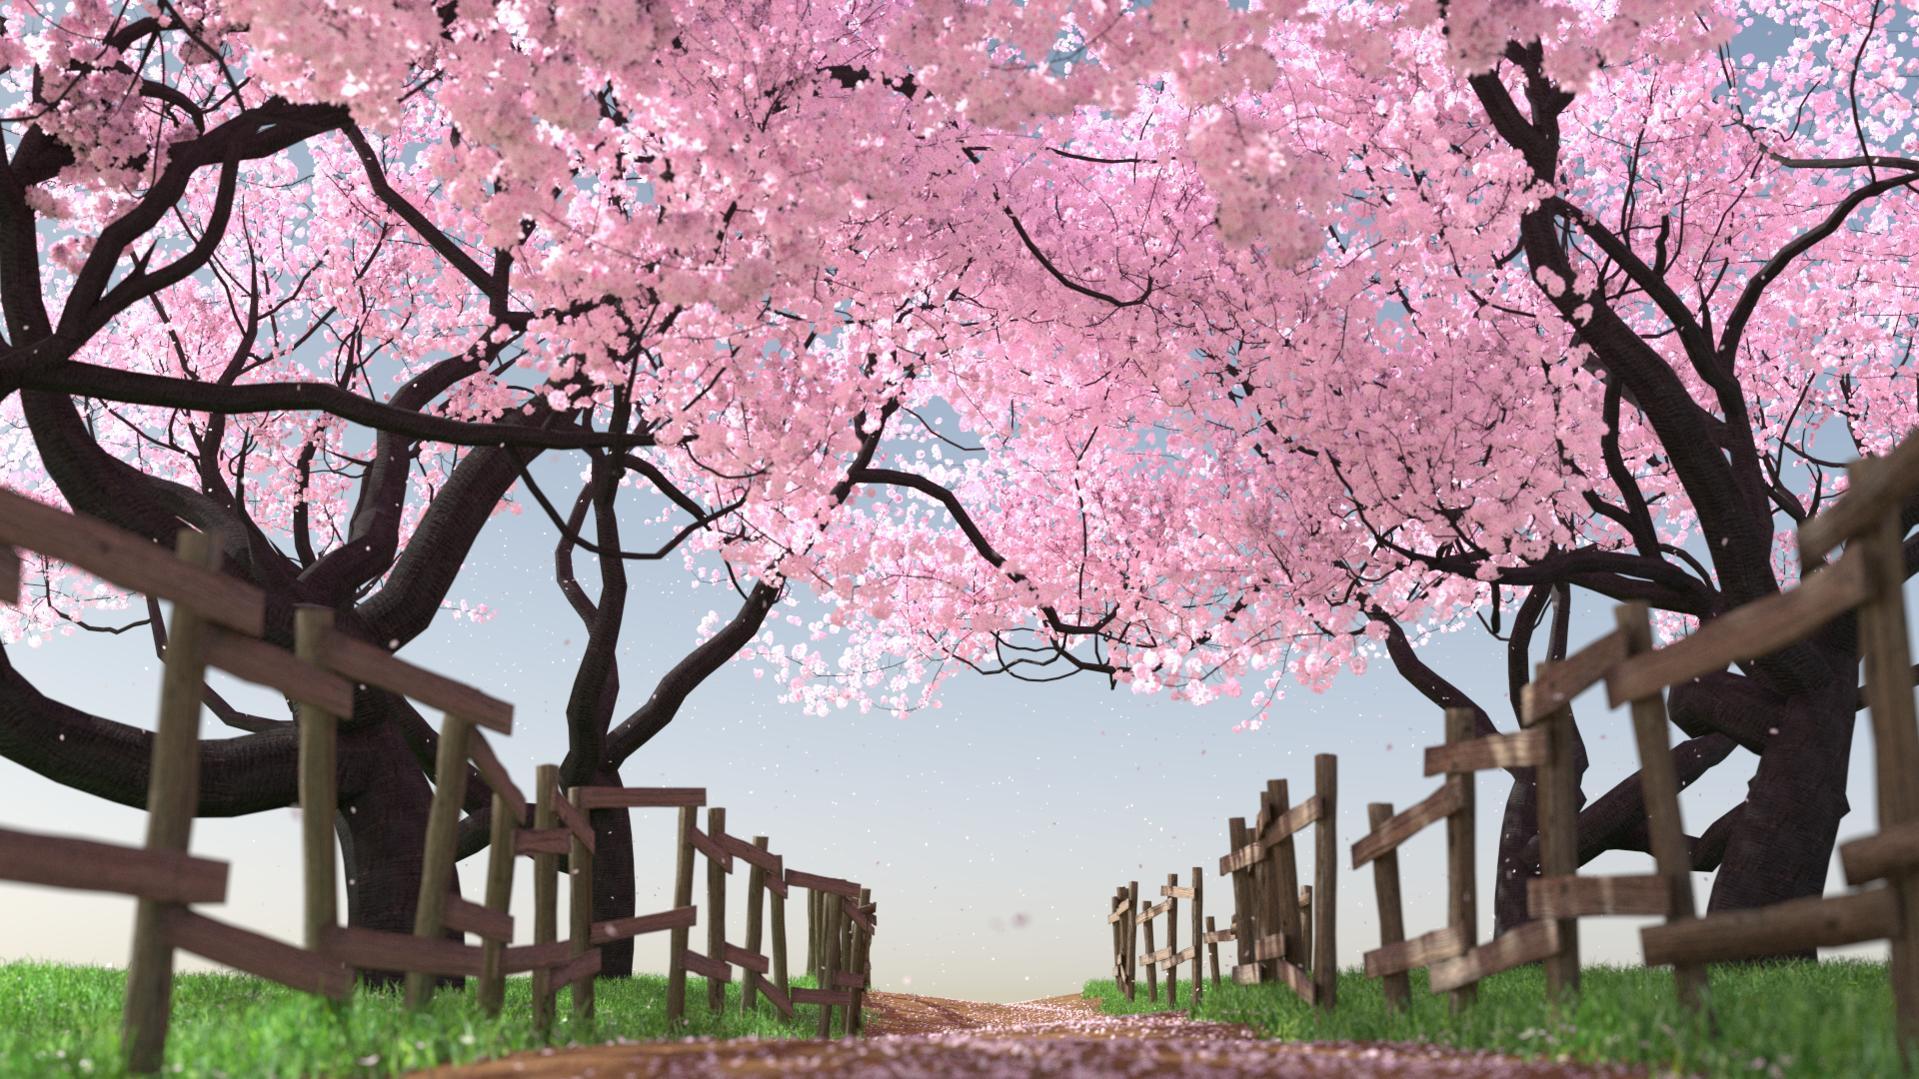 Sakura Tree Sidewalk Update 9 2 15 Focused Critiques